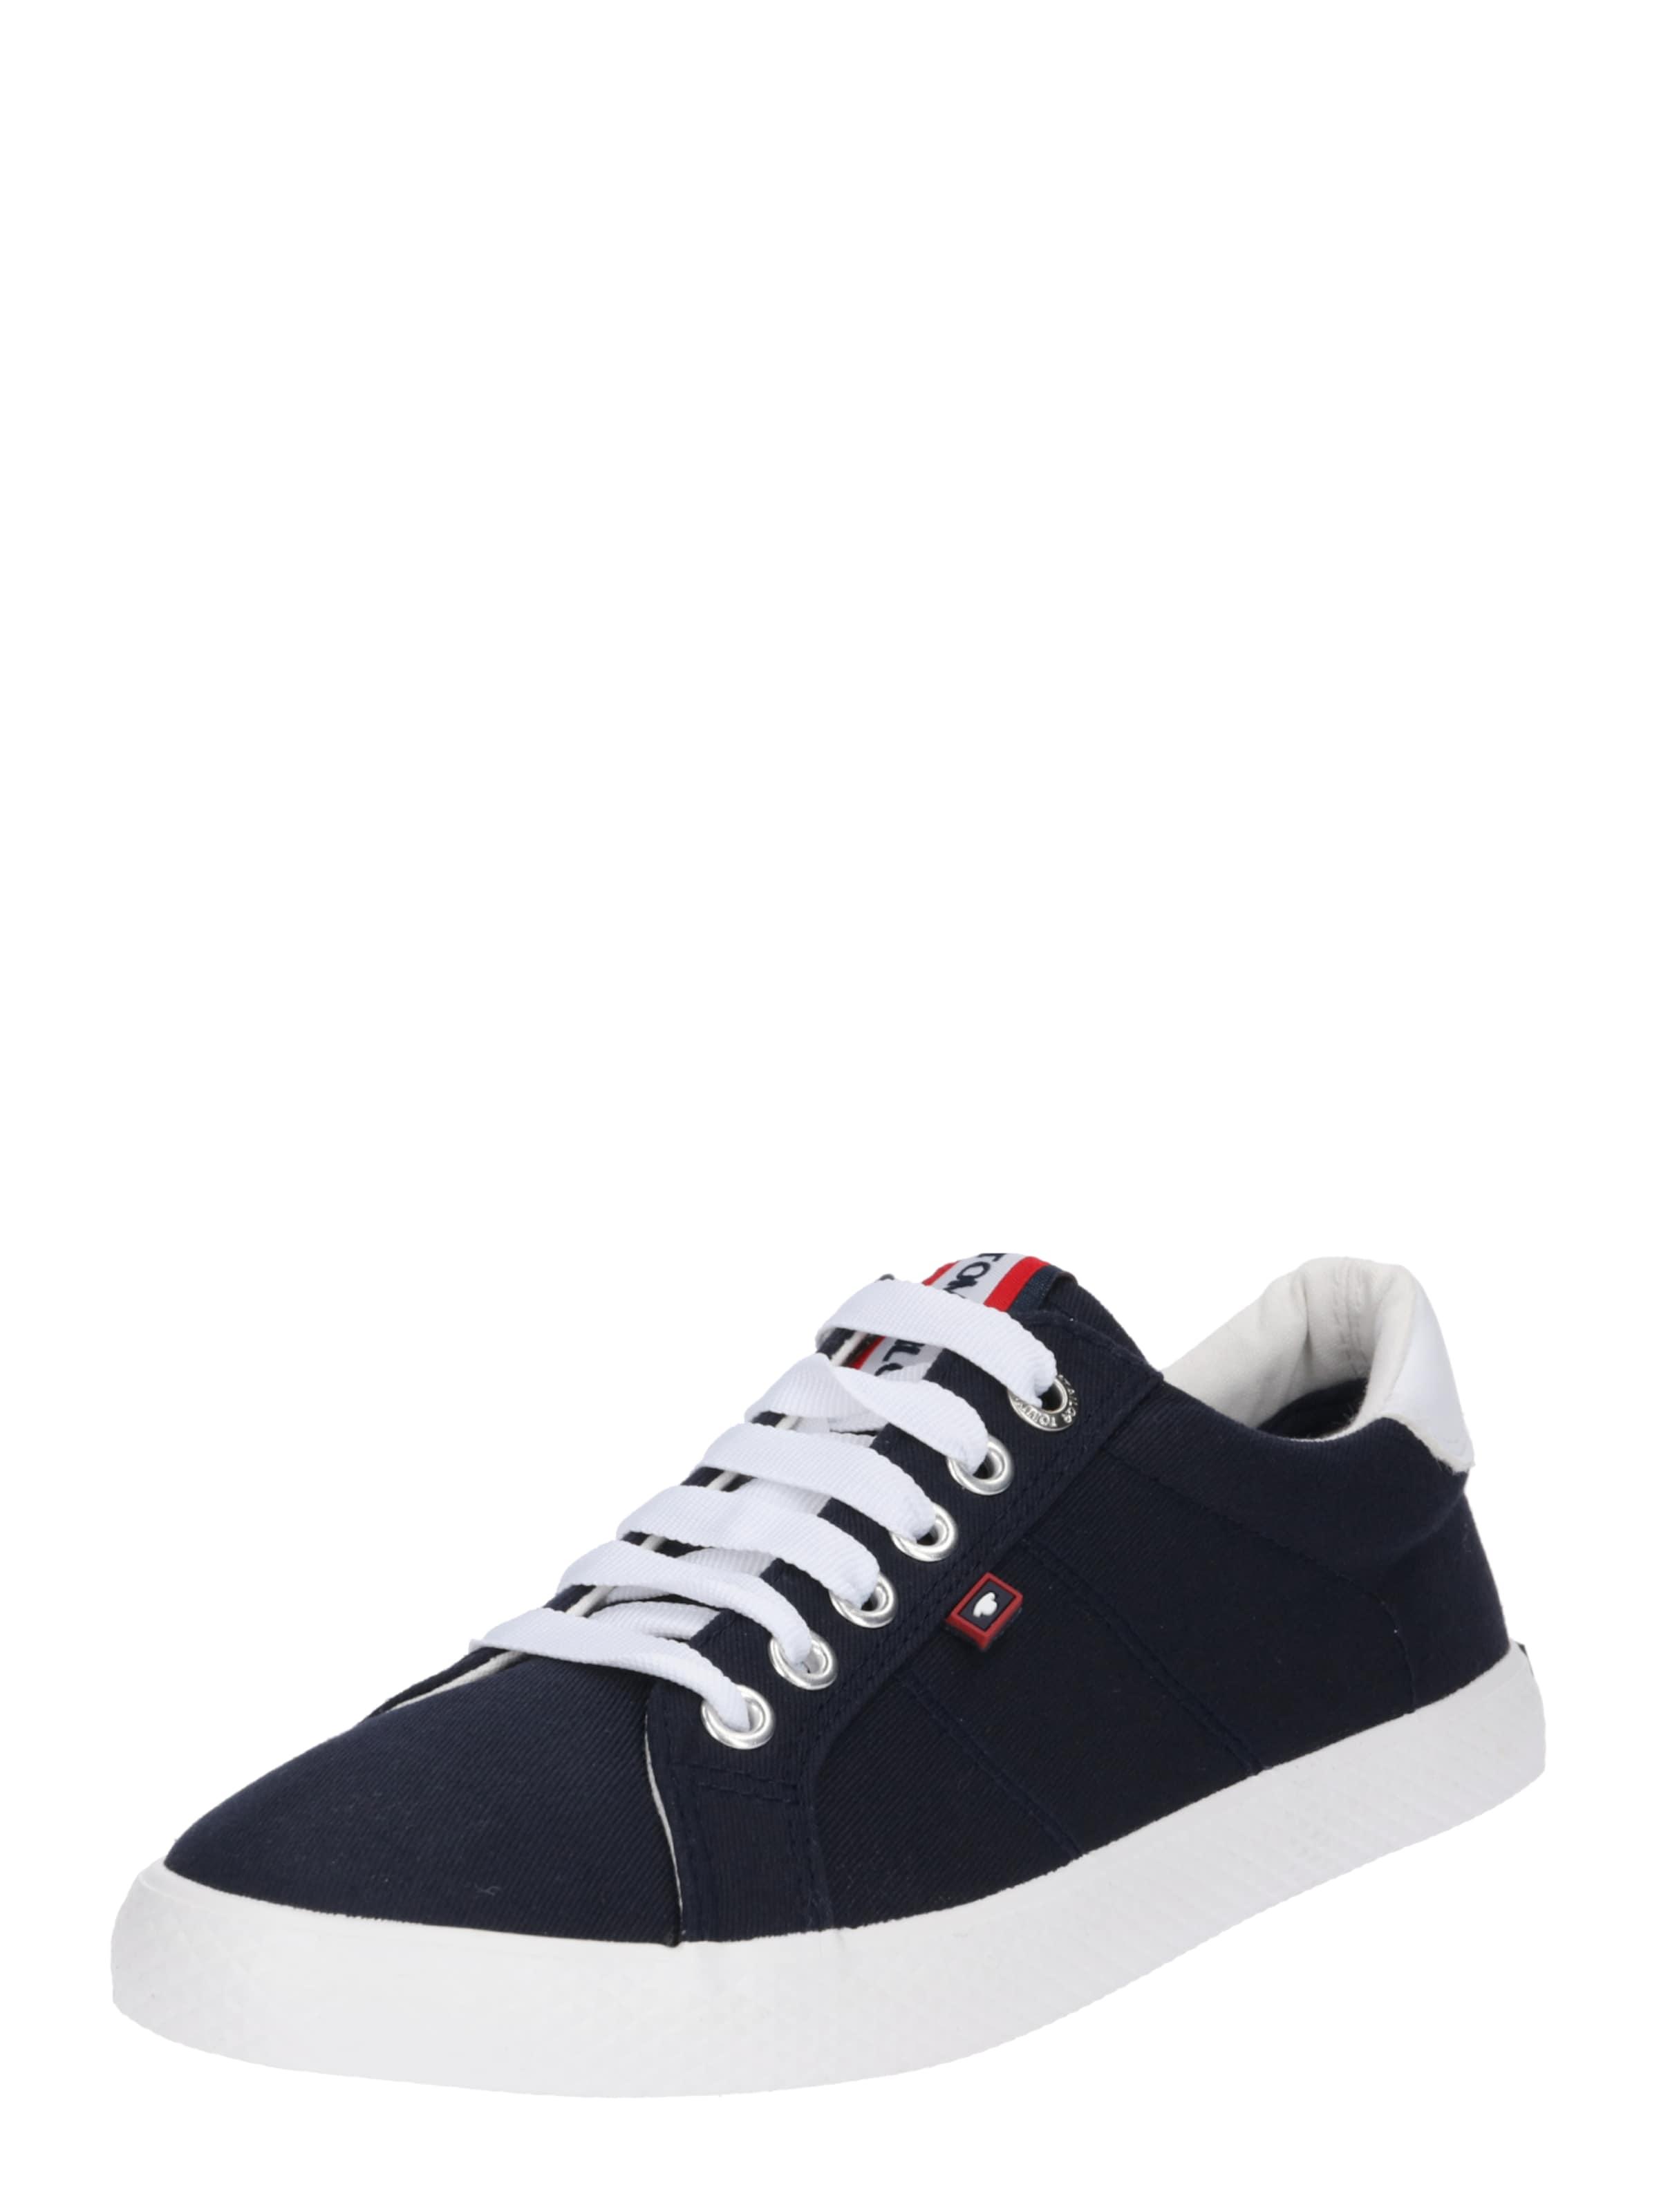 Sneaker Tailor Sneaker In Navy Tom Tom Tailor 8nwmv0PyON